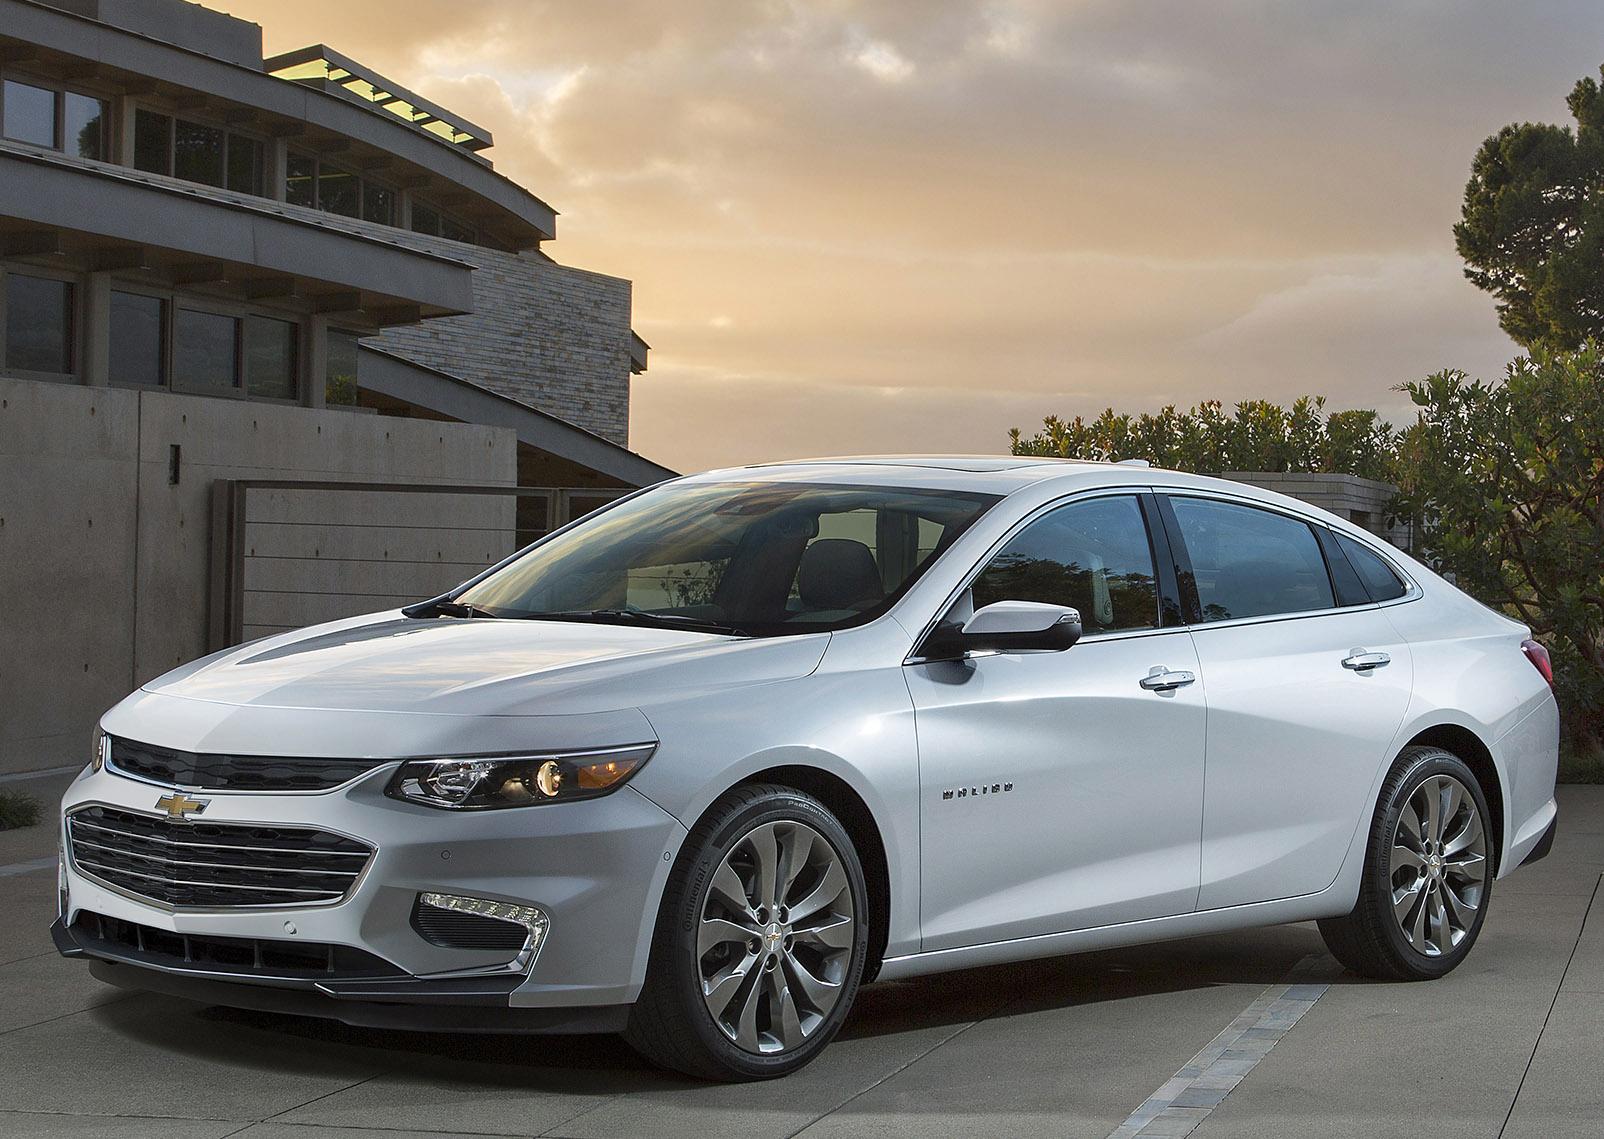 Chevrolet's Malibu sedan goes high-tech, gets hybrid version